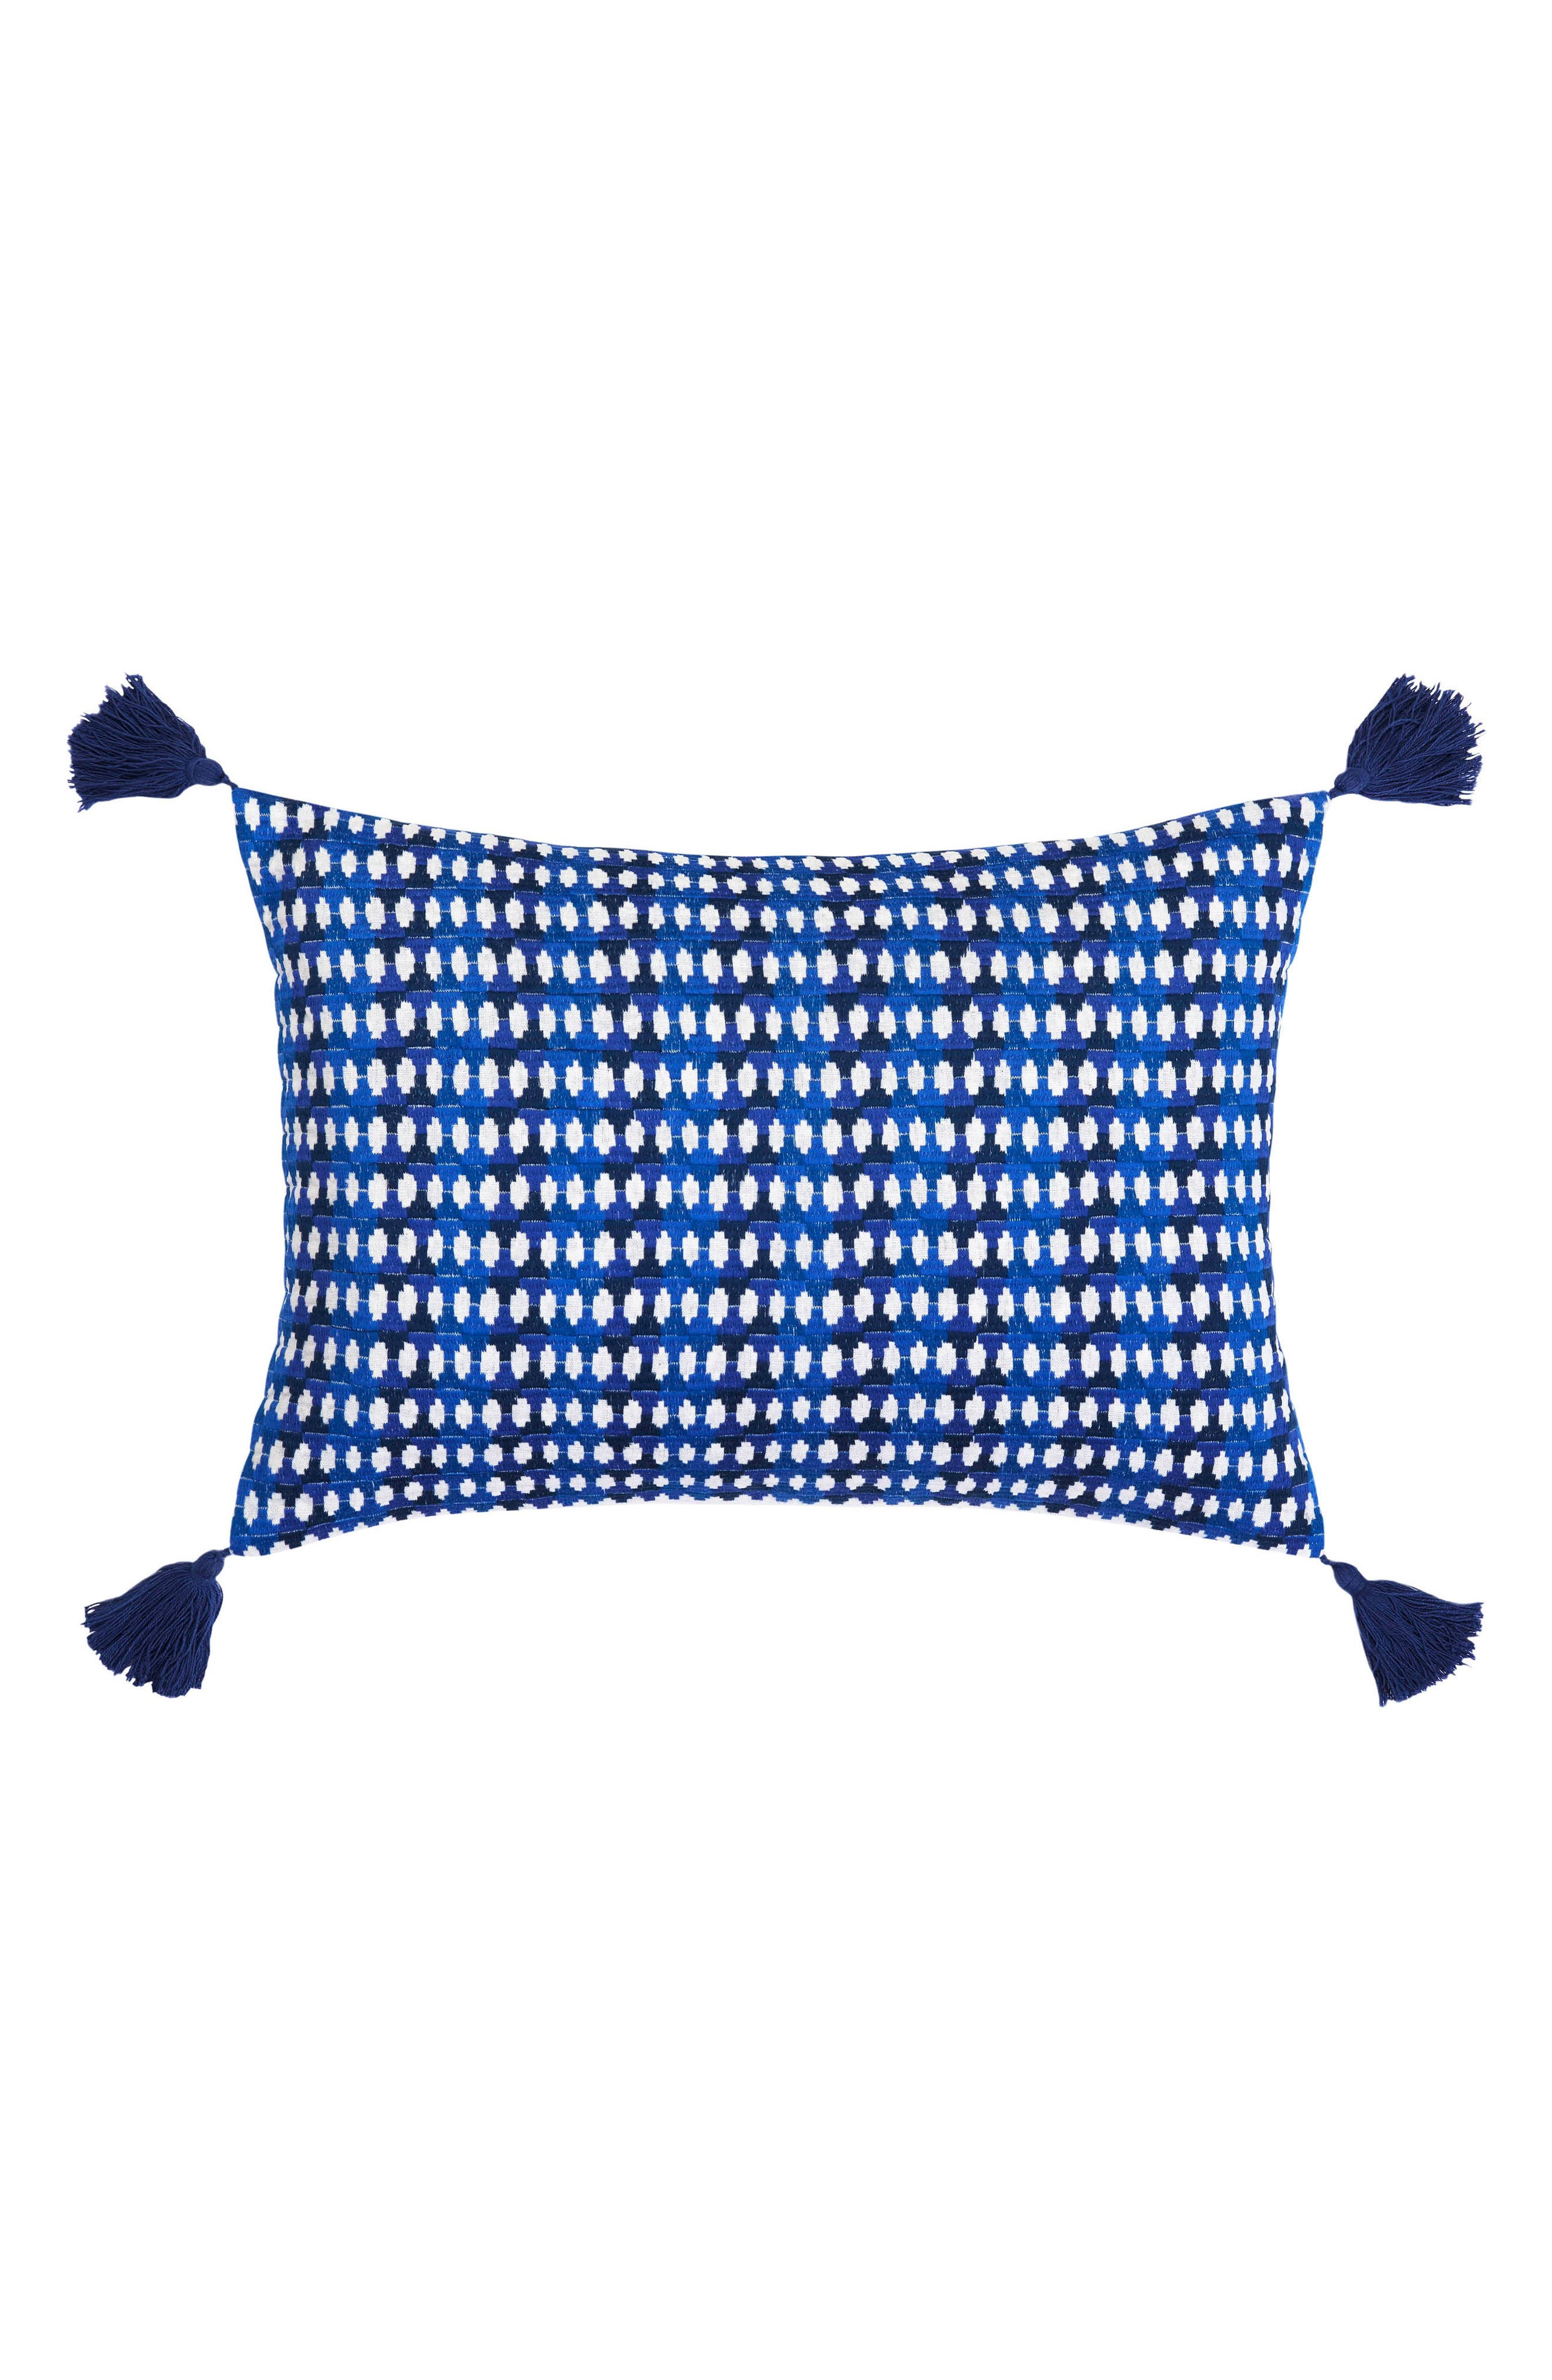 Samba de Roda Accent Pillow,                             Main thumbnail 1, color,                             DARK BLUE